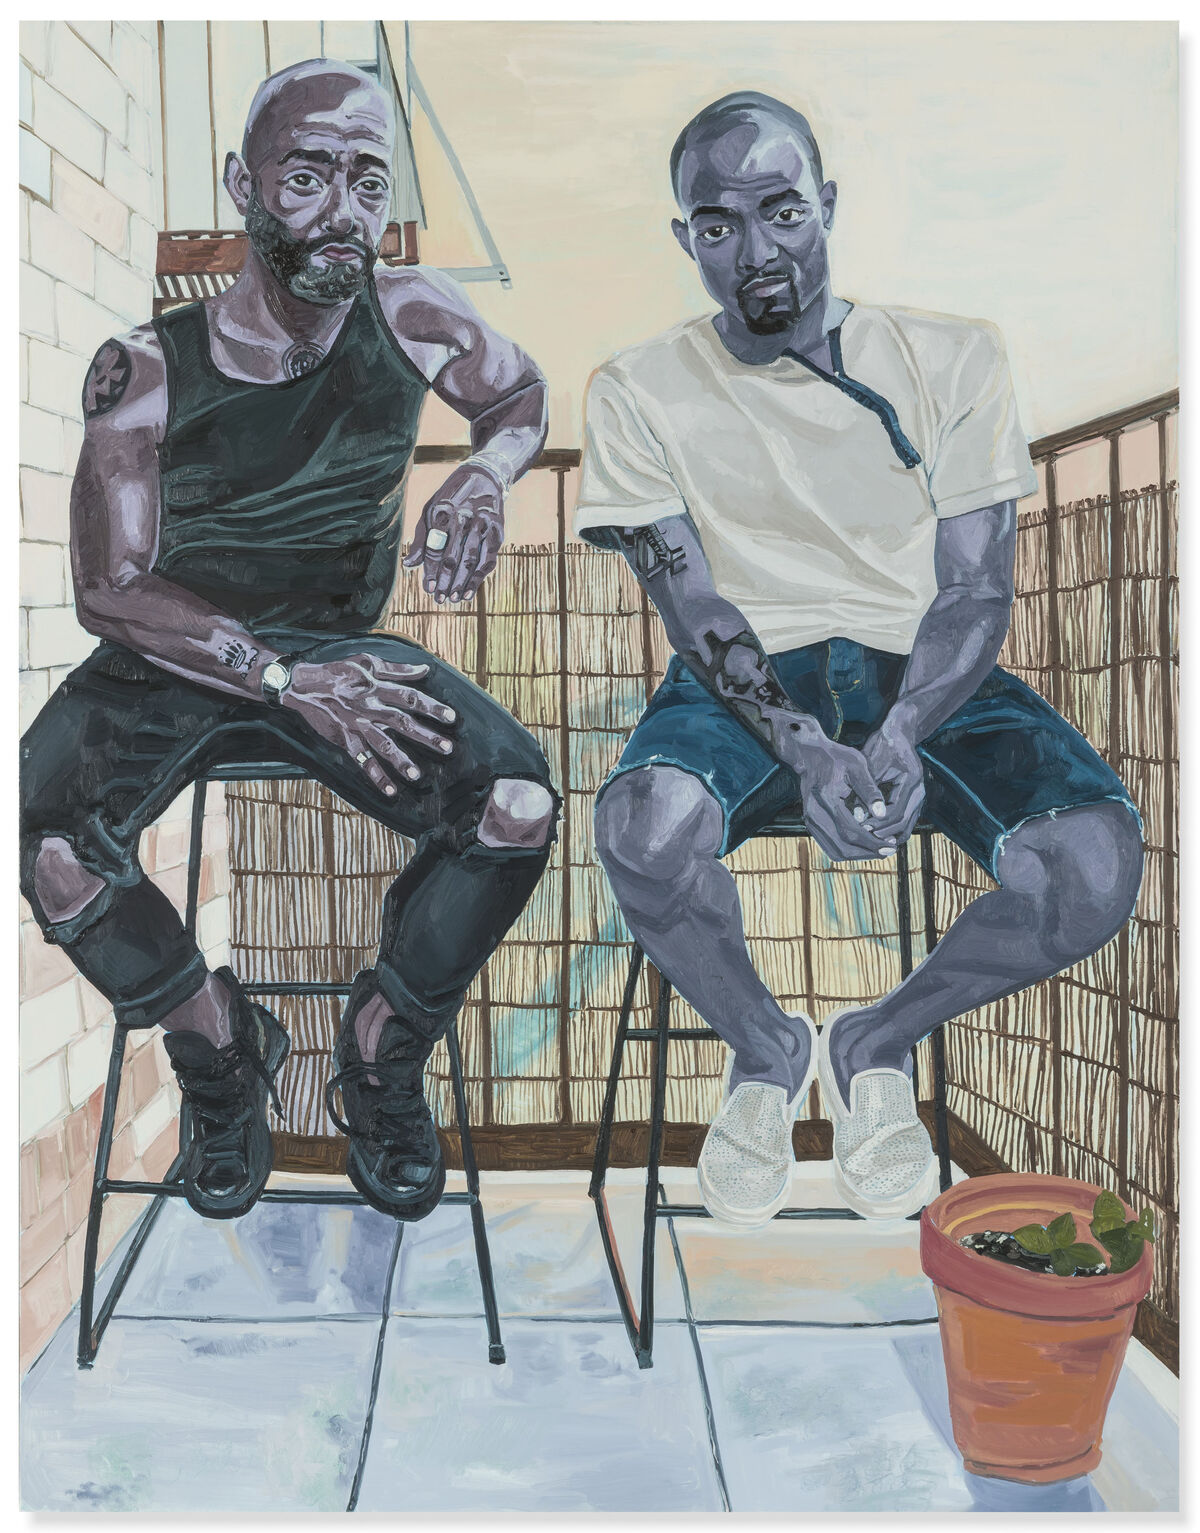 Jordan Casteel, Patrick and Omari, 2015. Courtesy of Christie's Images Ltd. 2019.